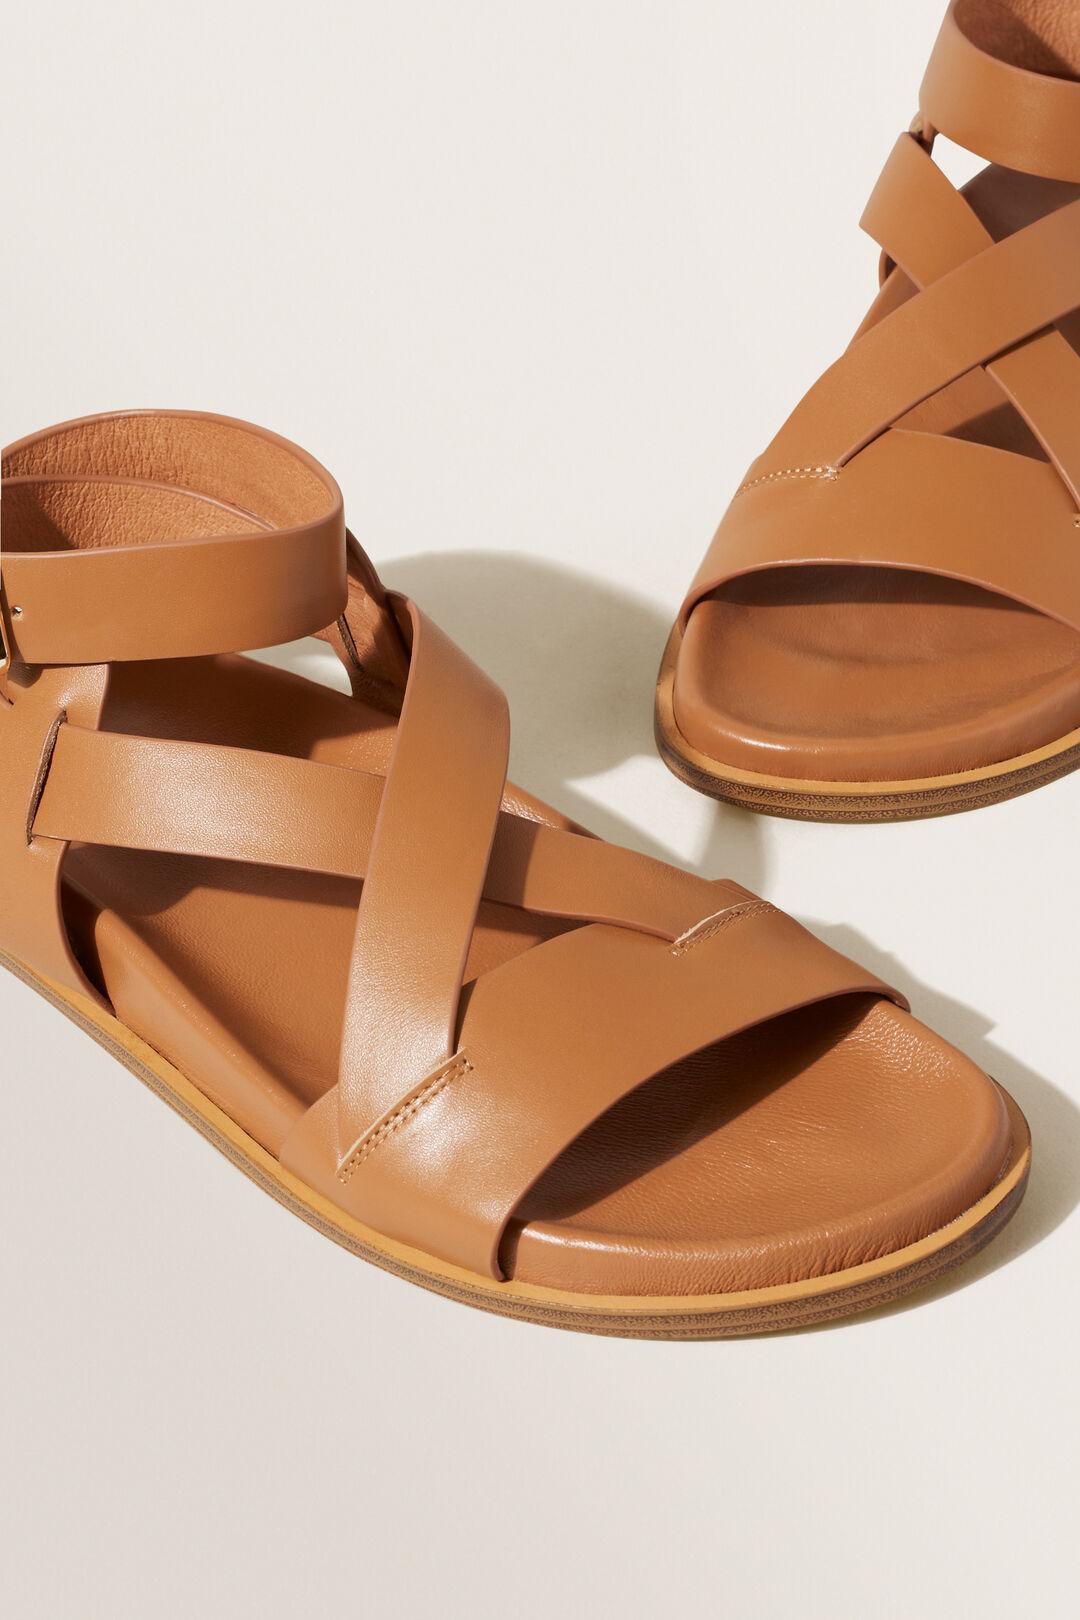 Emery Footbed Sandal  Tan  hi-res